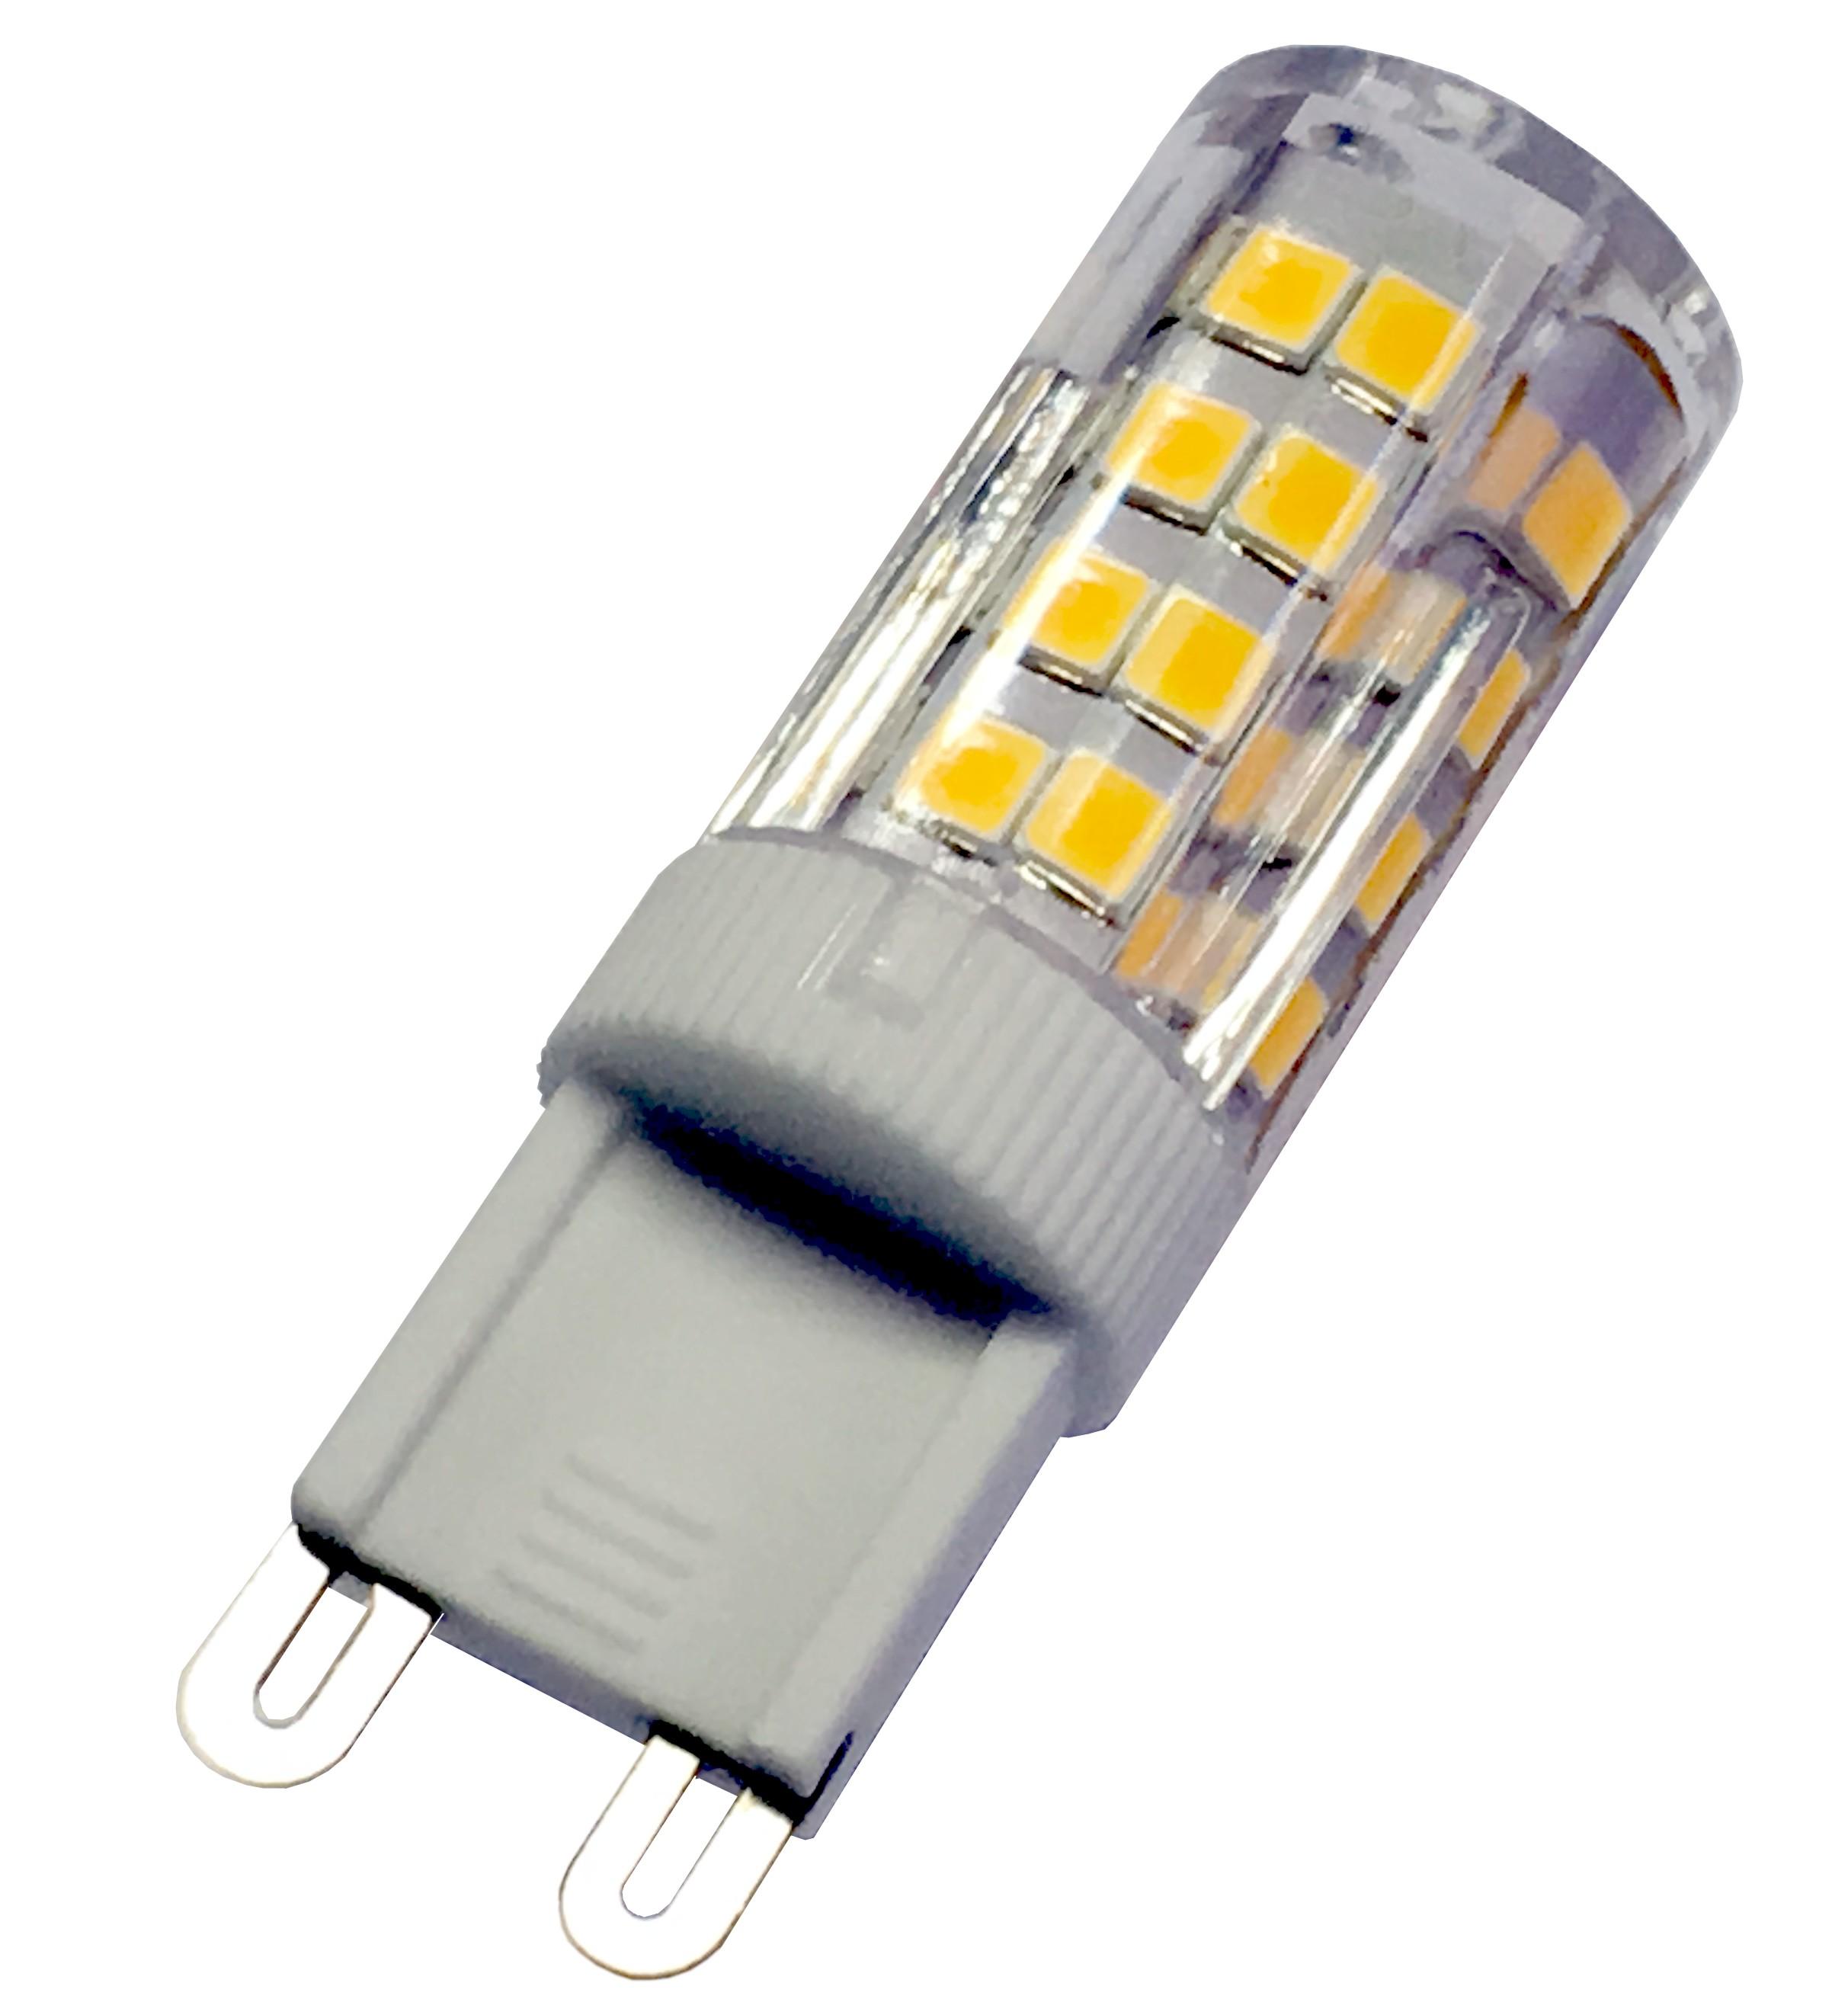 led lampen g9 best g led pico dimmbar lm w warmweiss ledlampen with led lampen g9 elegant w. Black Bedroom Furniture Sets. Home Design Ideas